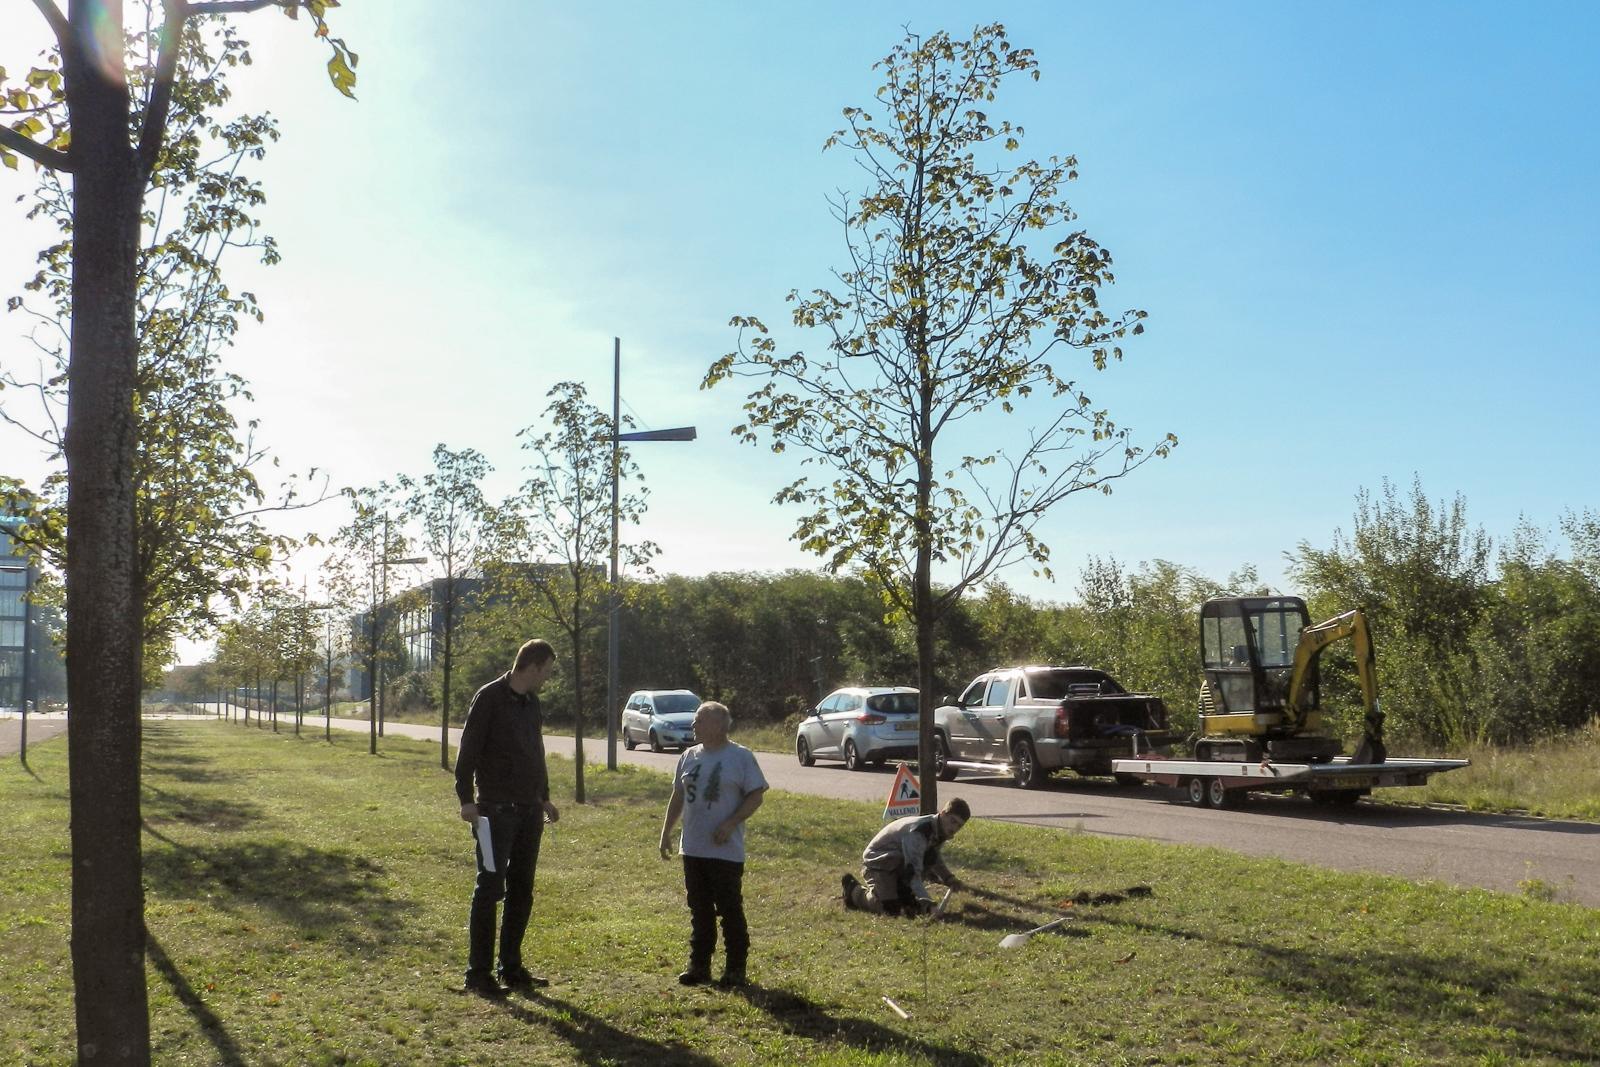 moenchengladbach-borussiapark-01